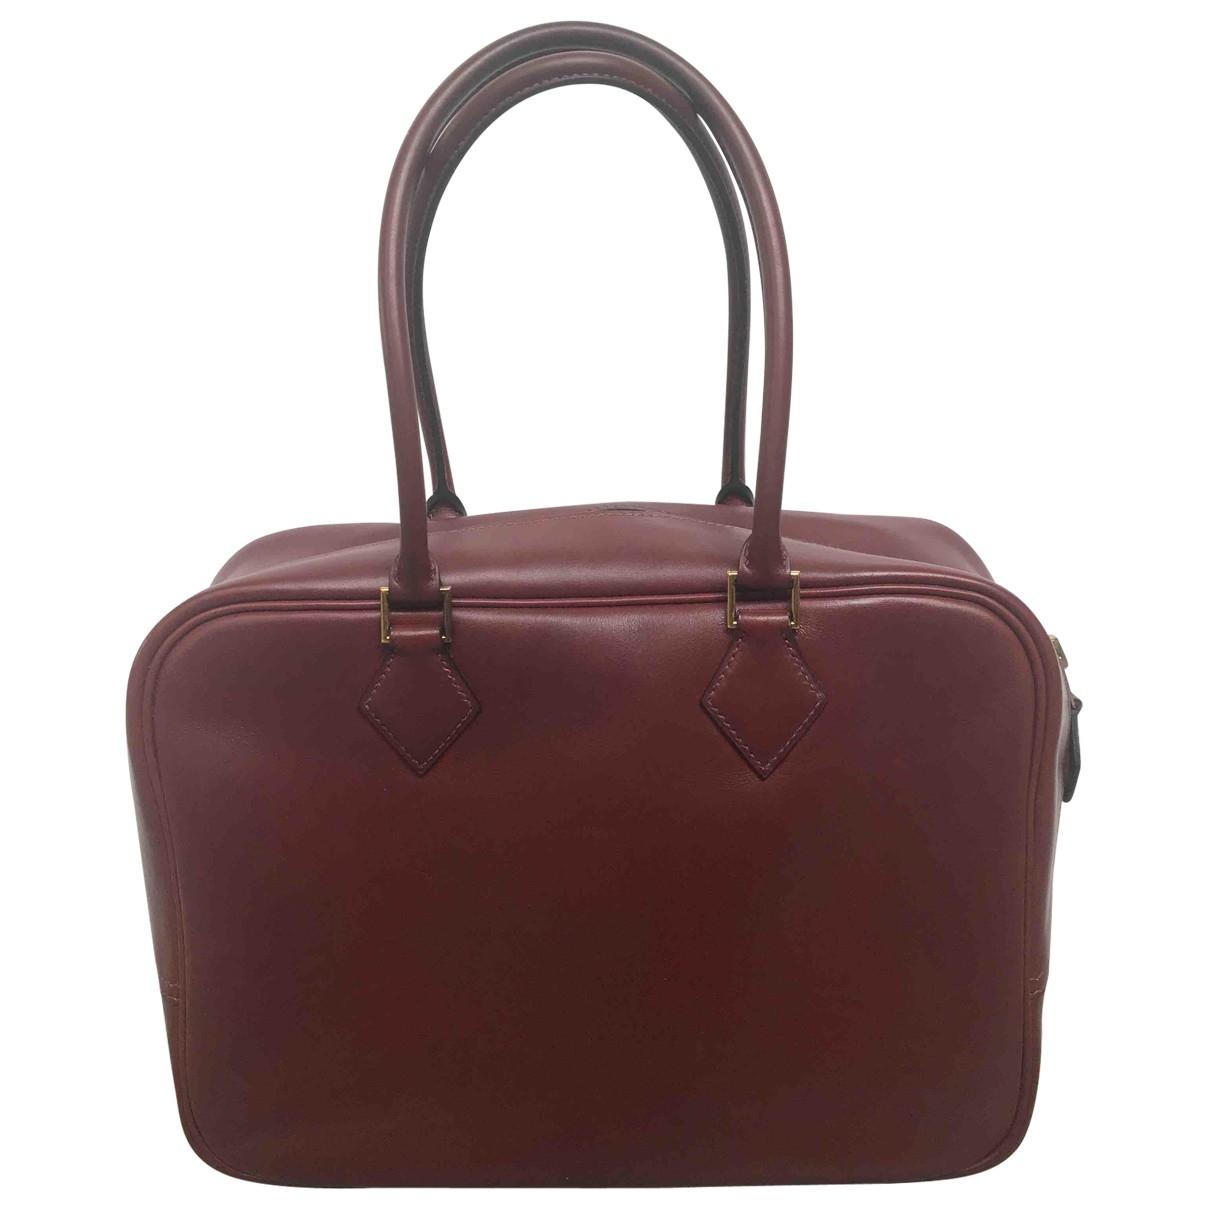 Hermes Plume Handtasche in  Bordeauxrot Leder